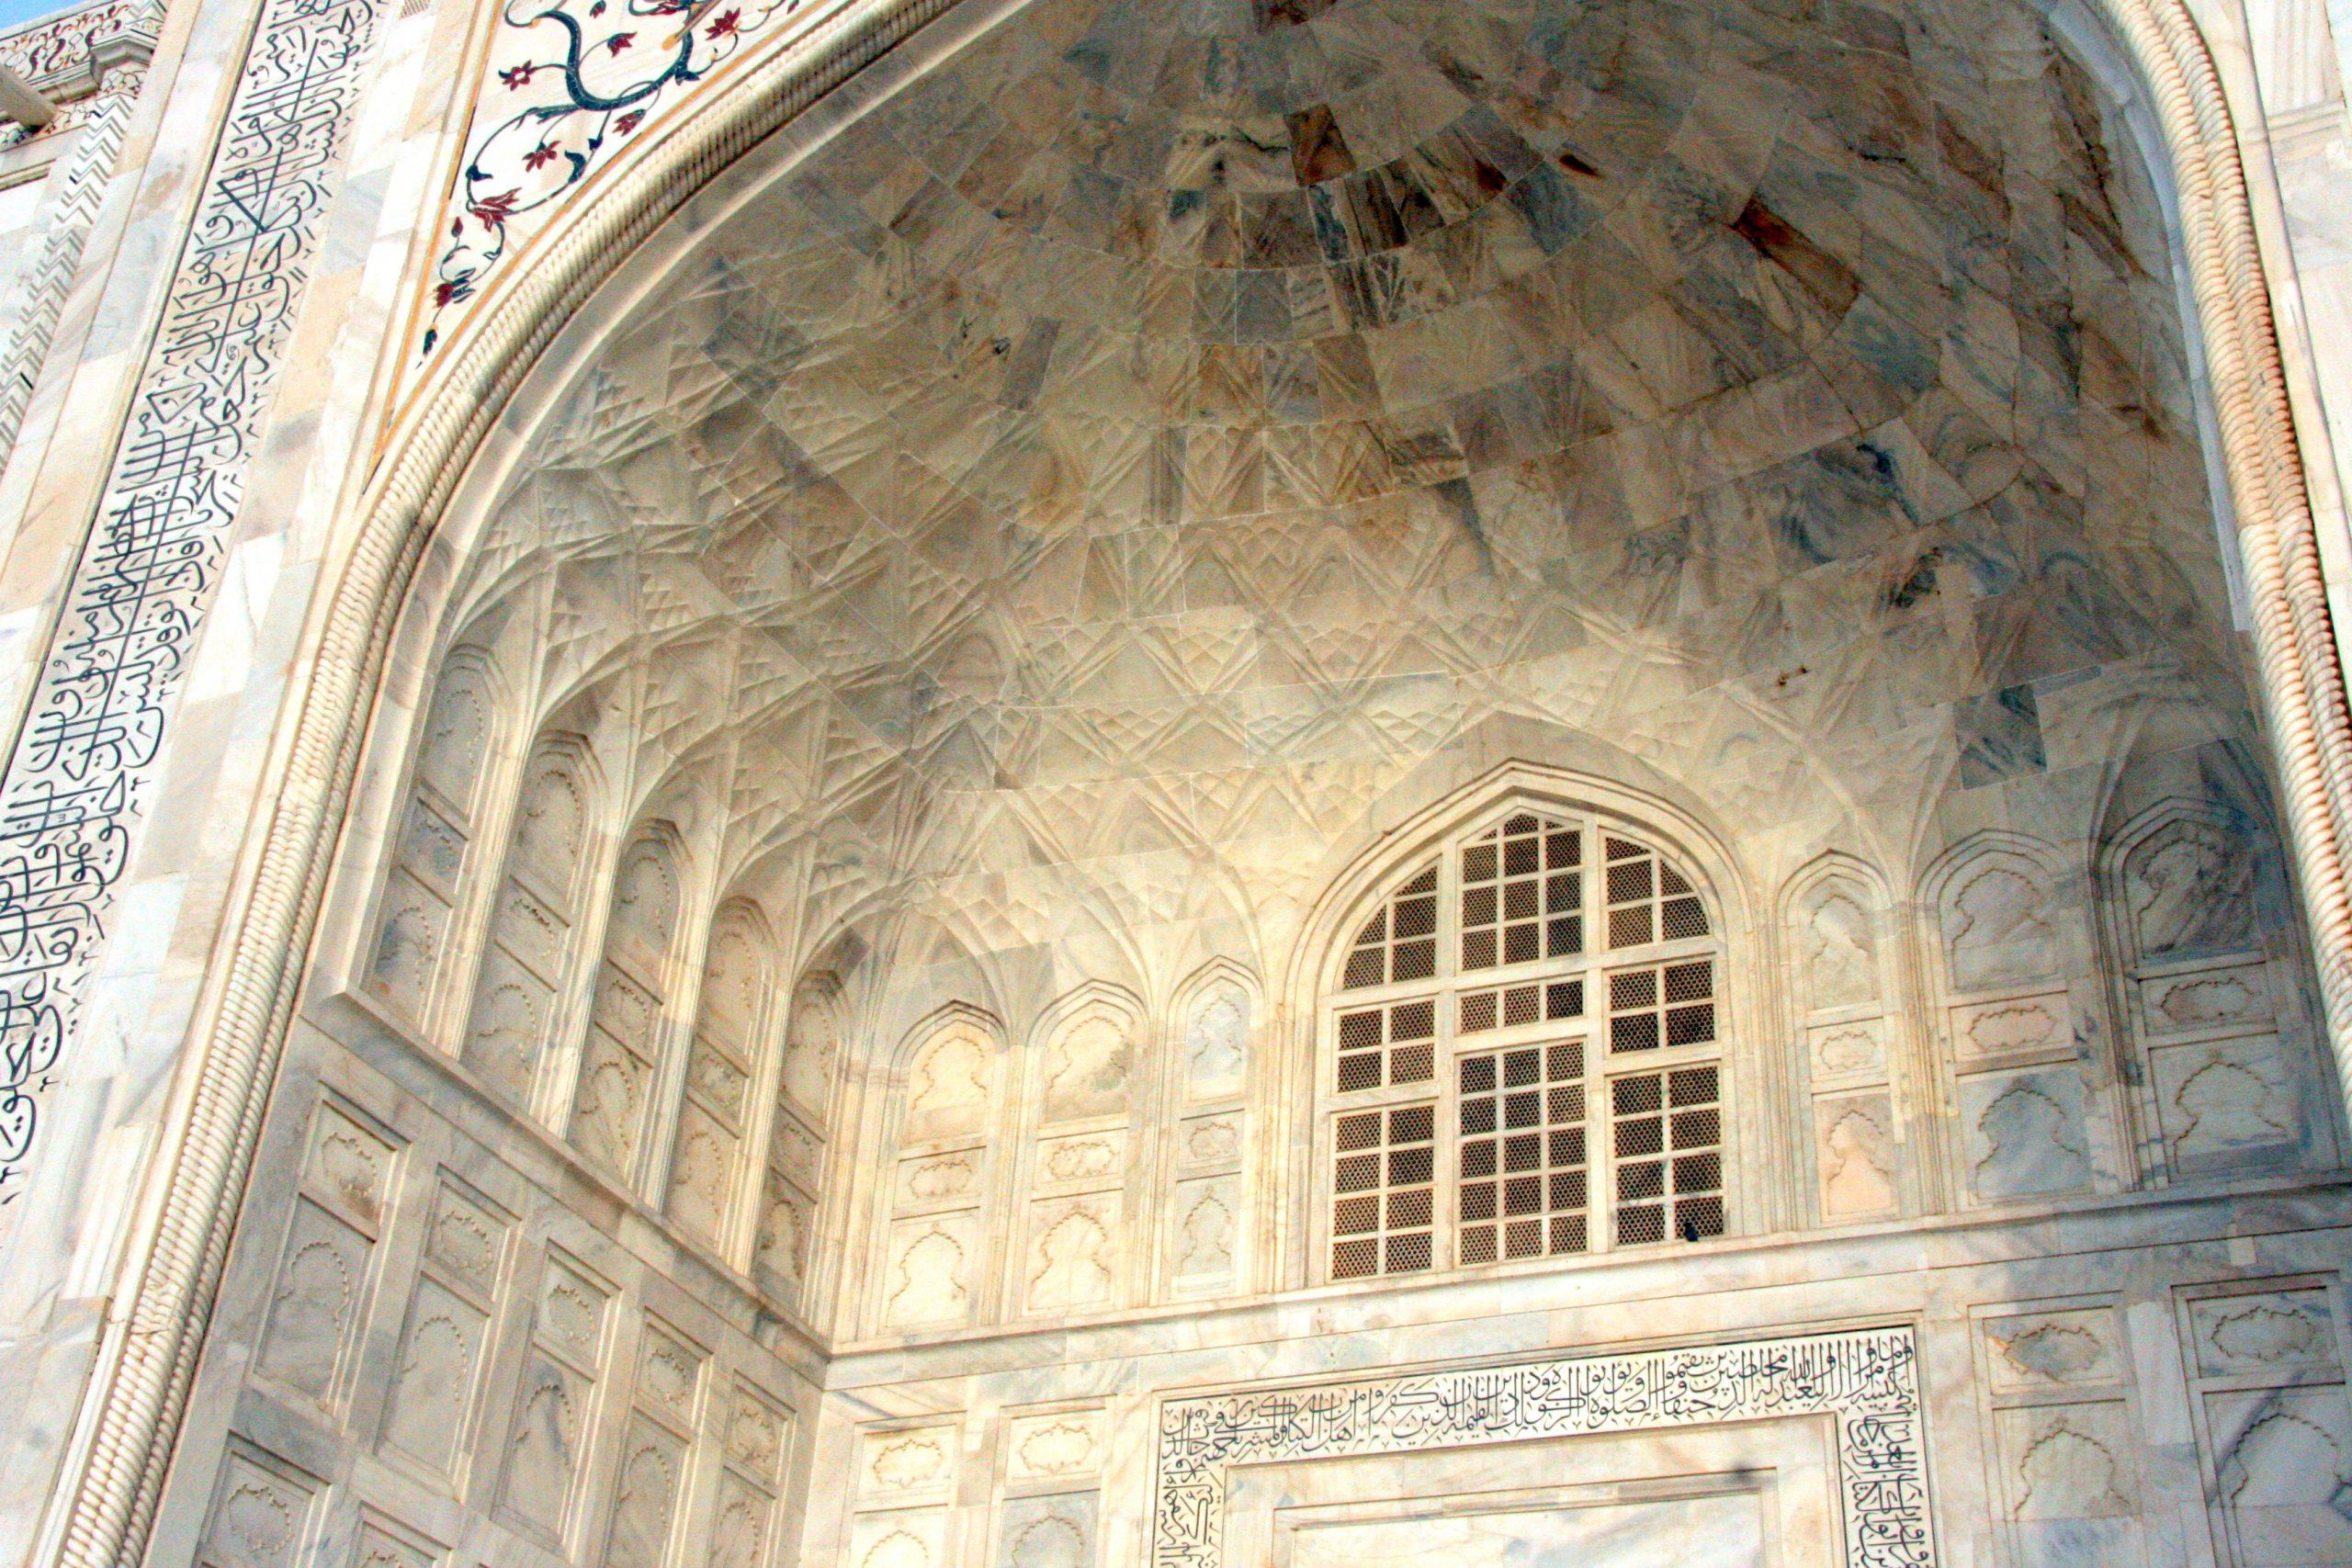 2015, Taj Mahal, Agra, India